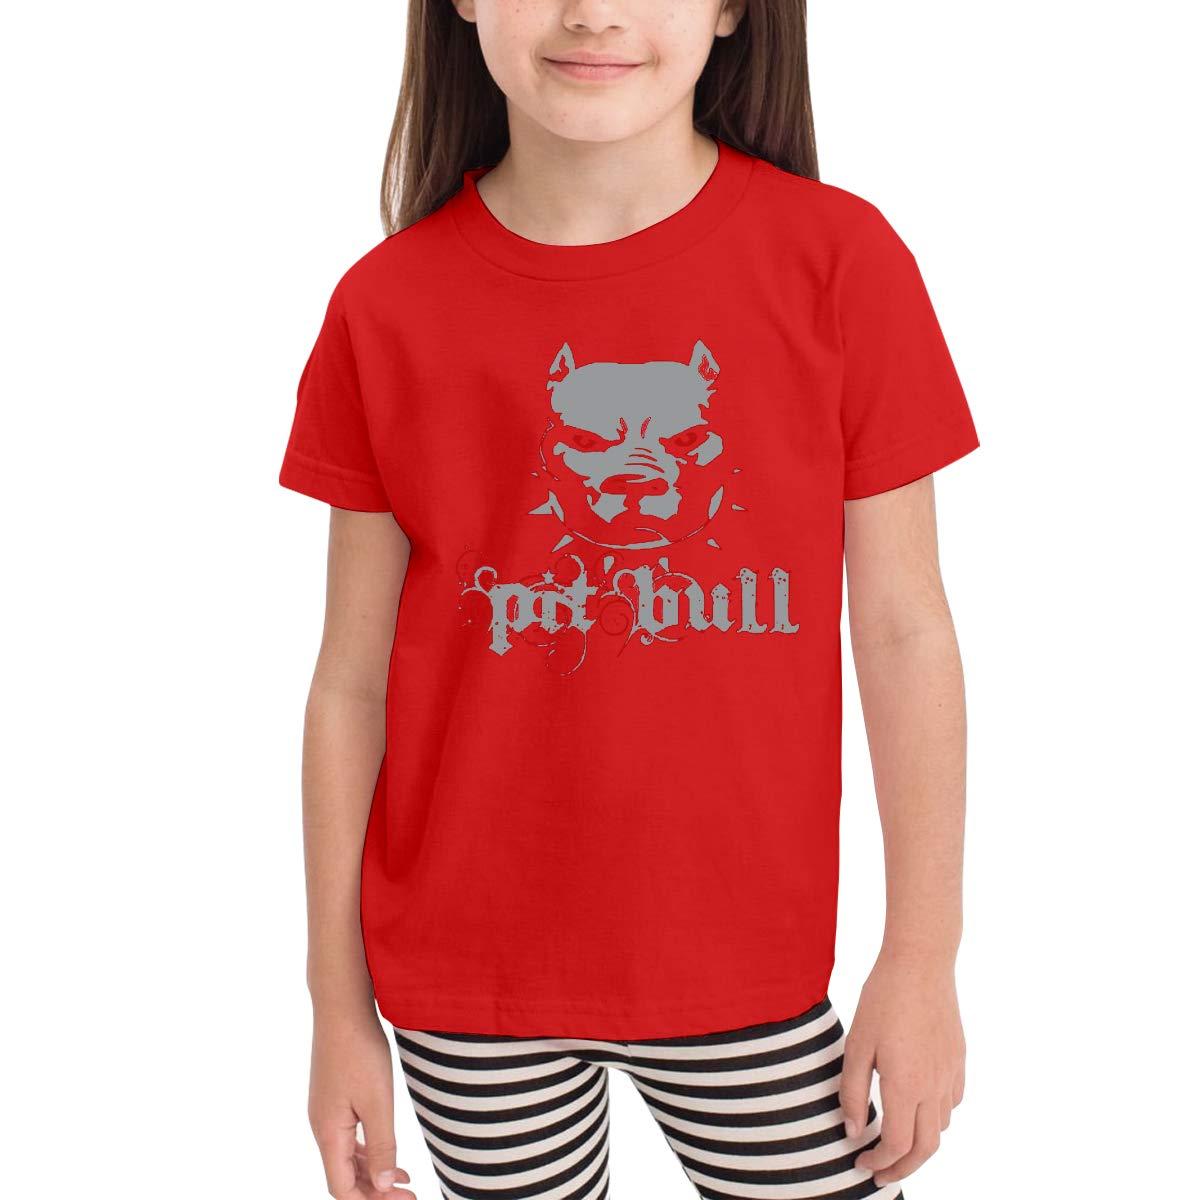 Kids T-Shirt Tops Black Cool Pitbull Unisex Youths Short Sleeve T-Shirt